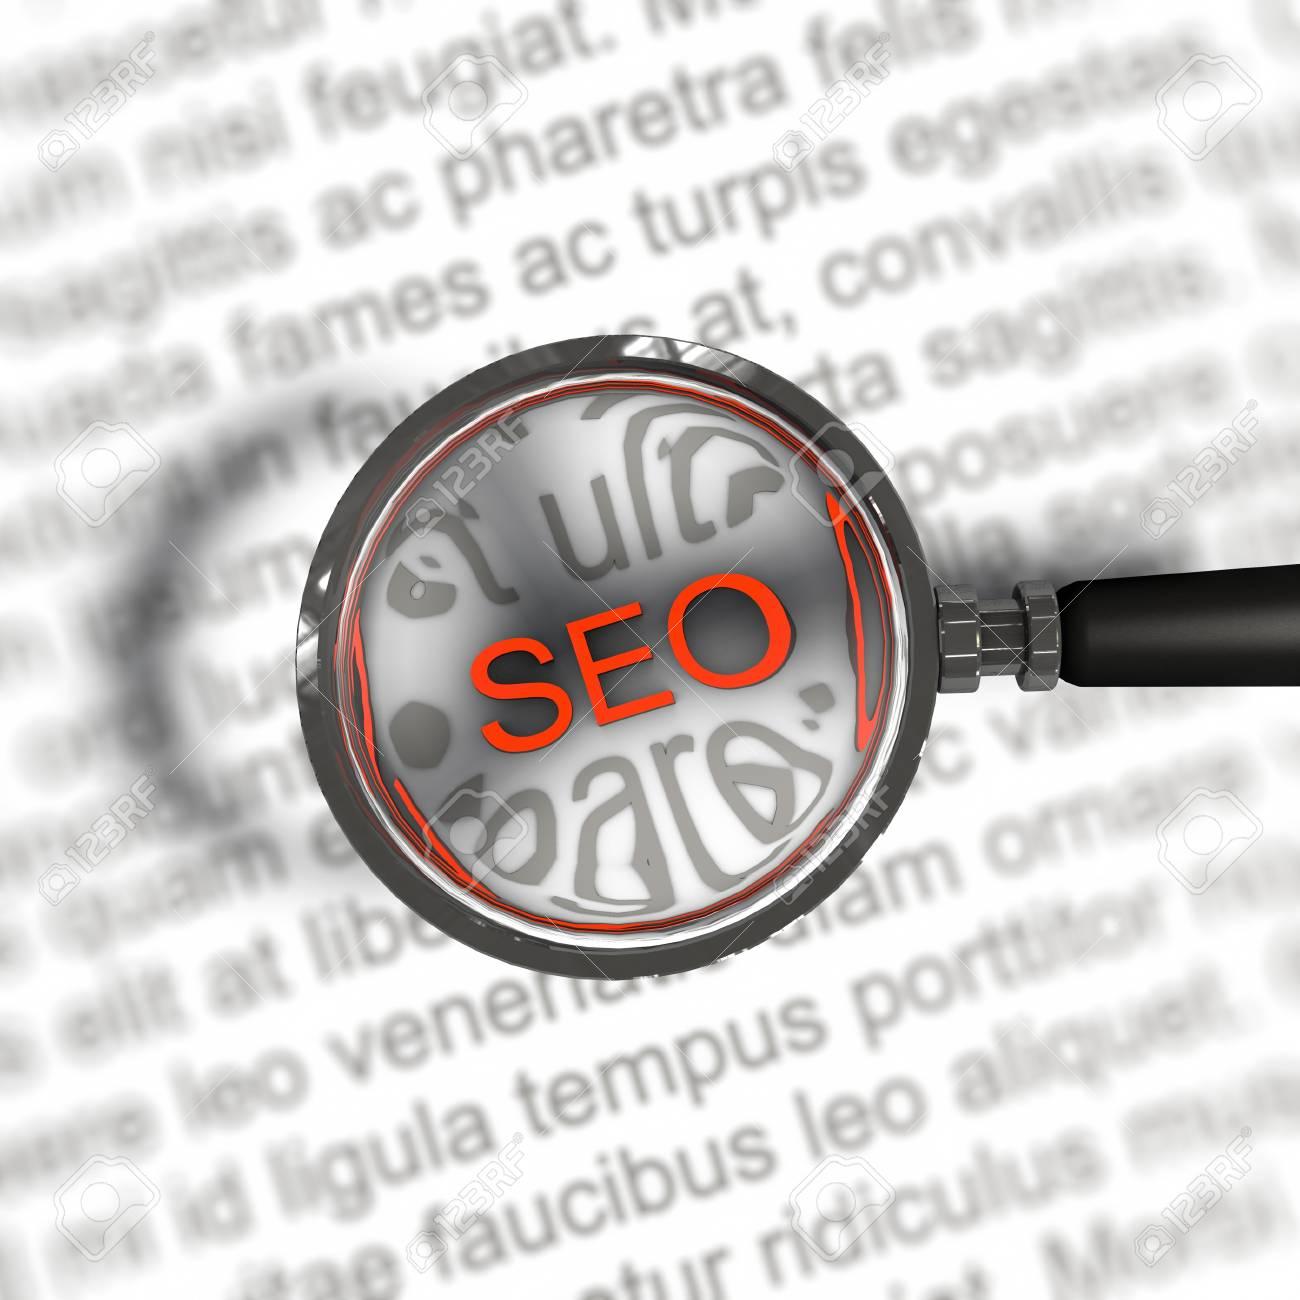 a pictogram to symbolize search engine optimization Stock Photo - 13142934